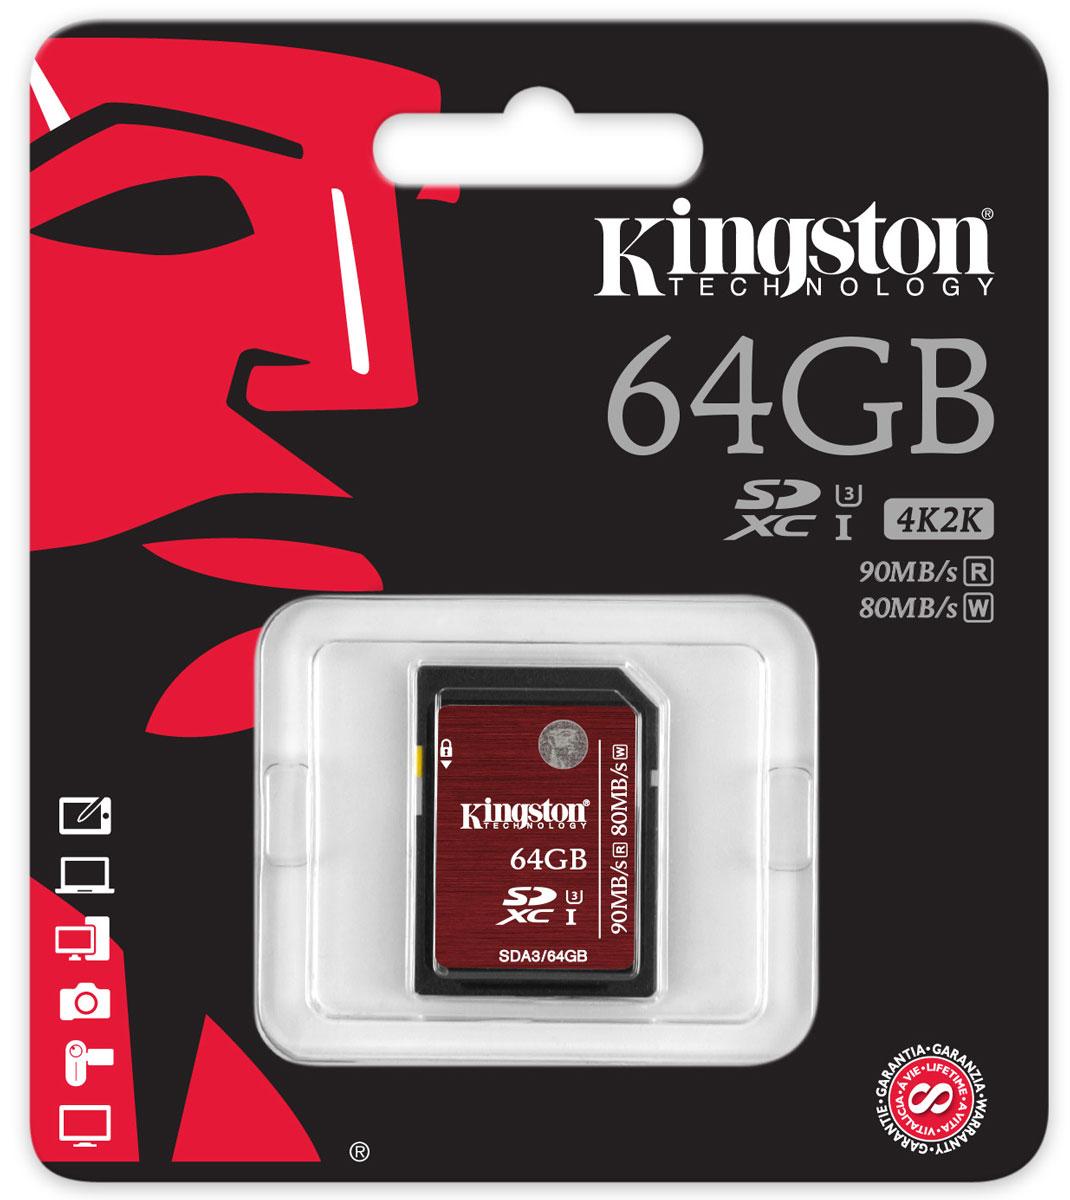 Kingston SDXC Class 10 UHS-I U3 64GB карта памяти